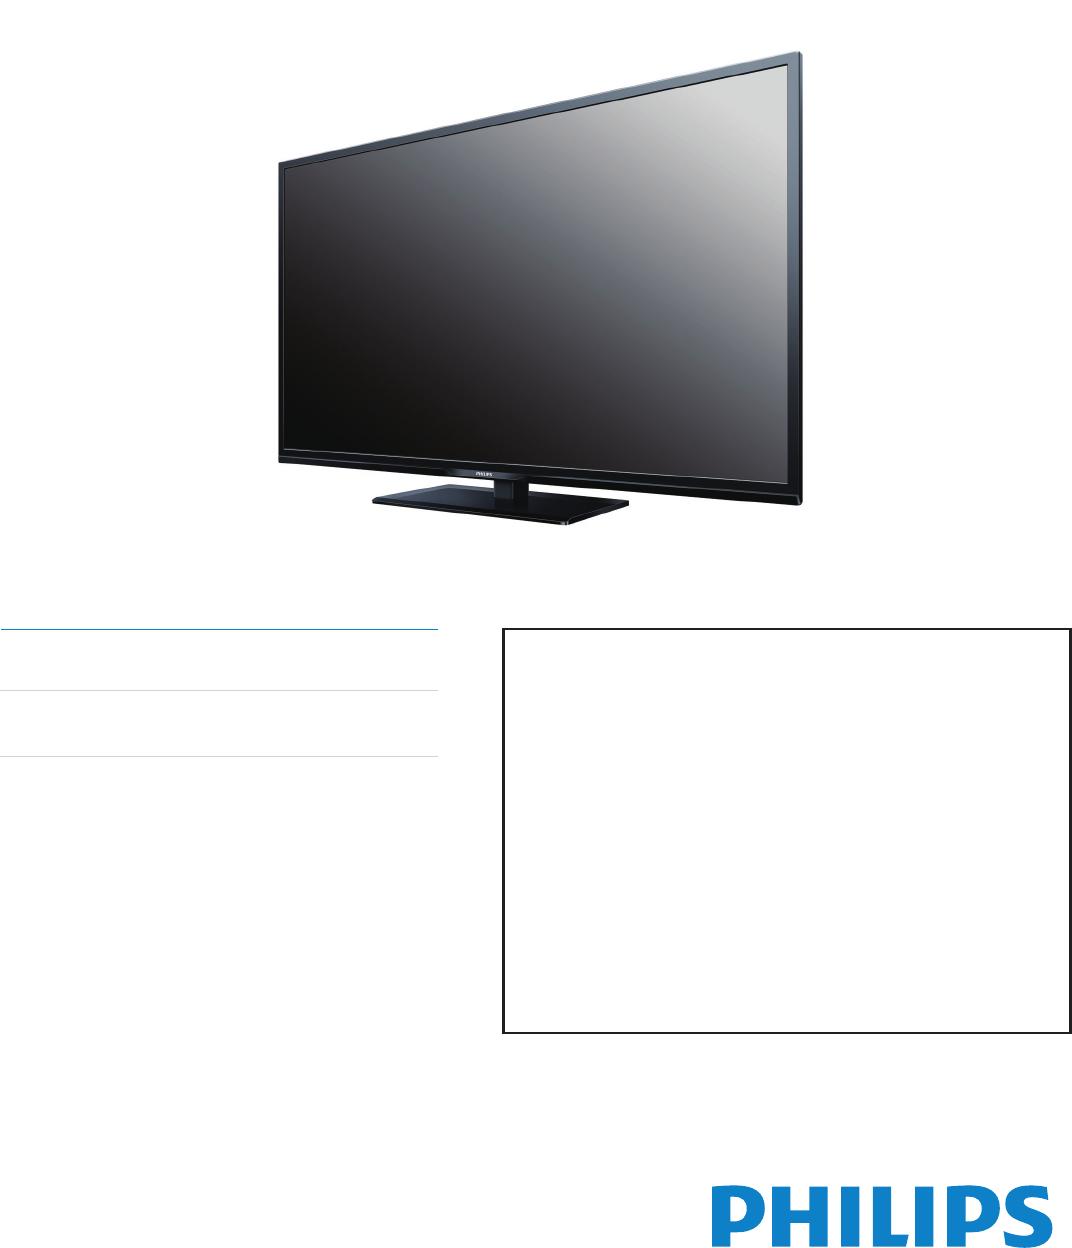 /Mando a Distancia 2/en 1/para TV para Audiovisual Video Philips Philips/